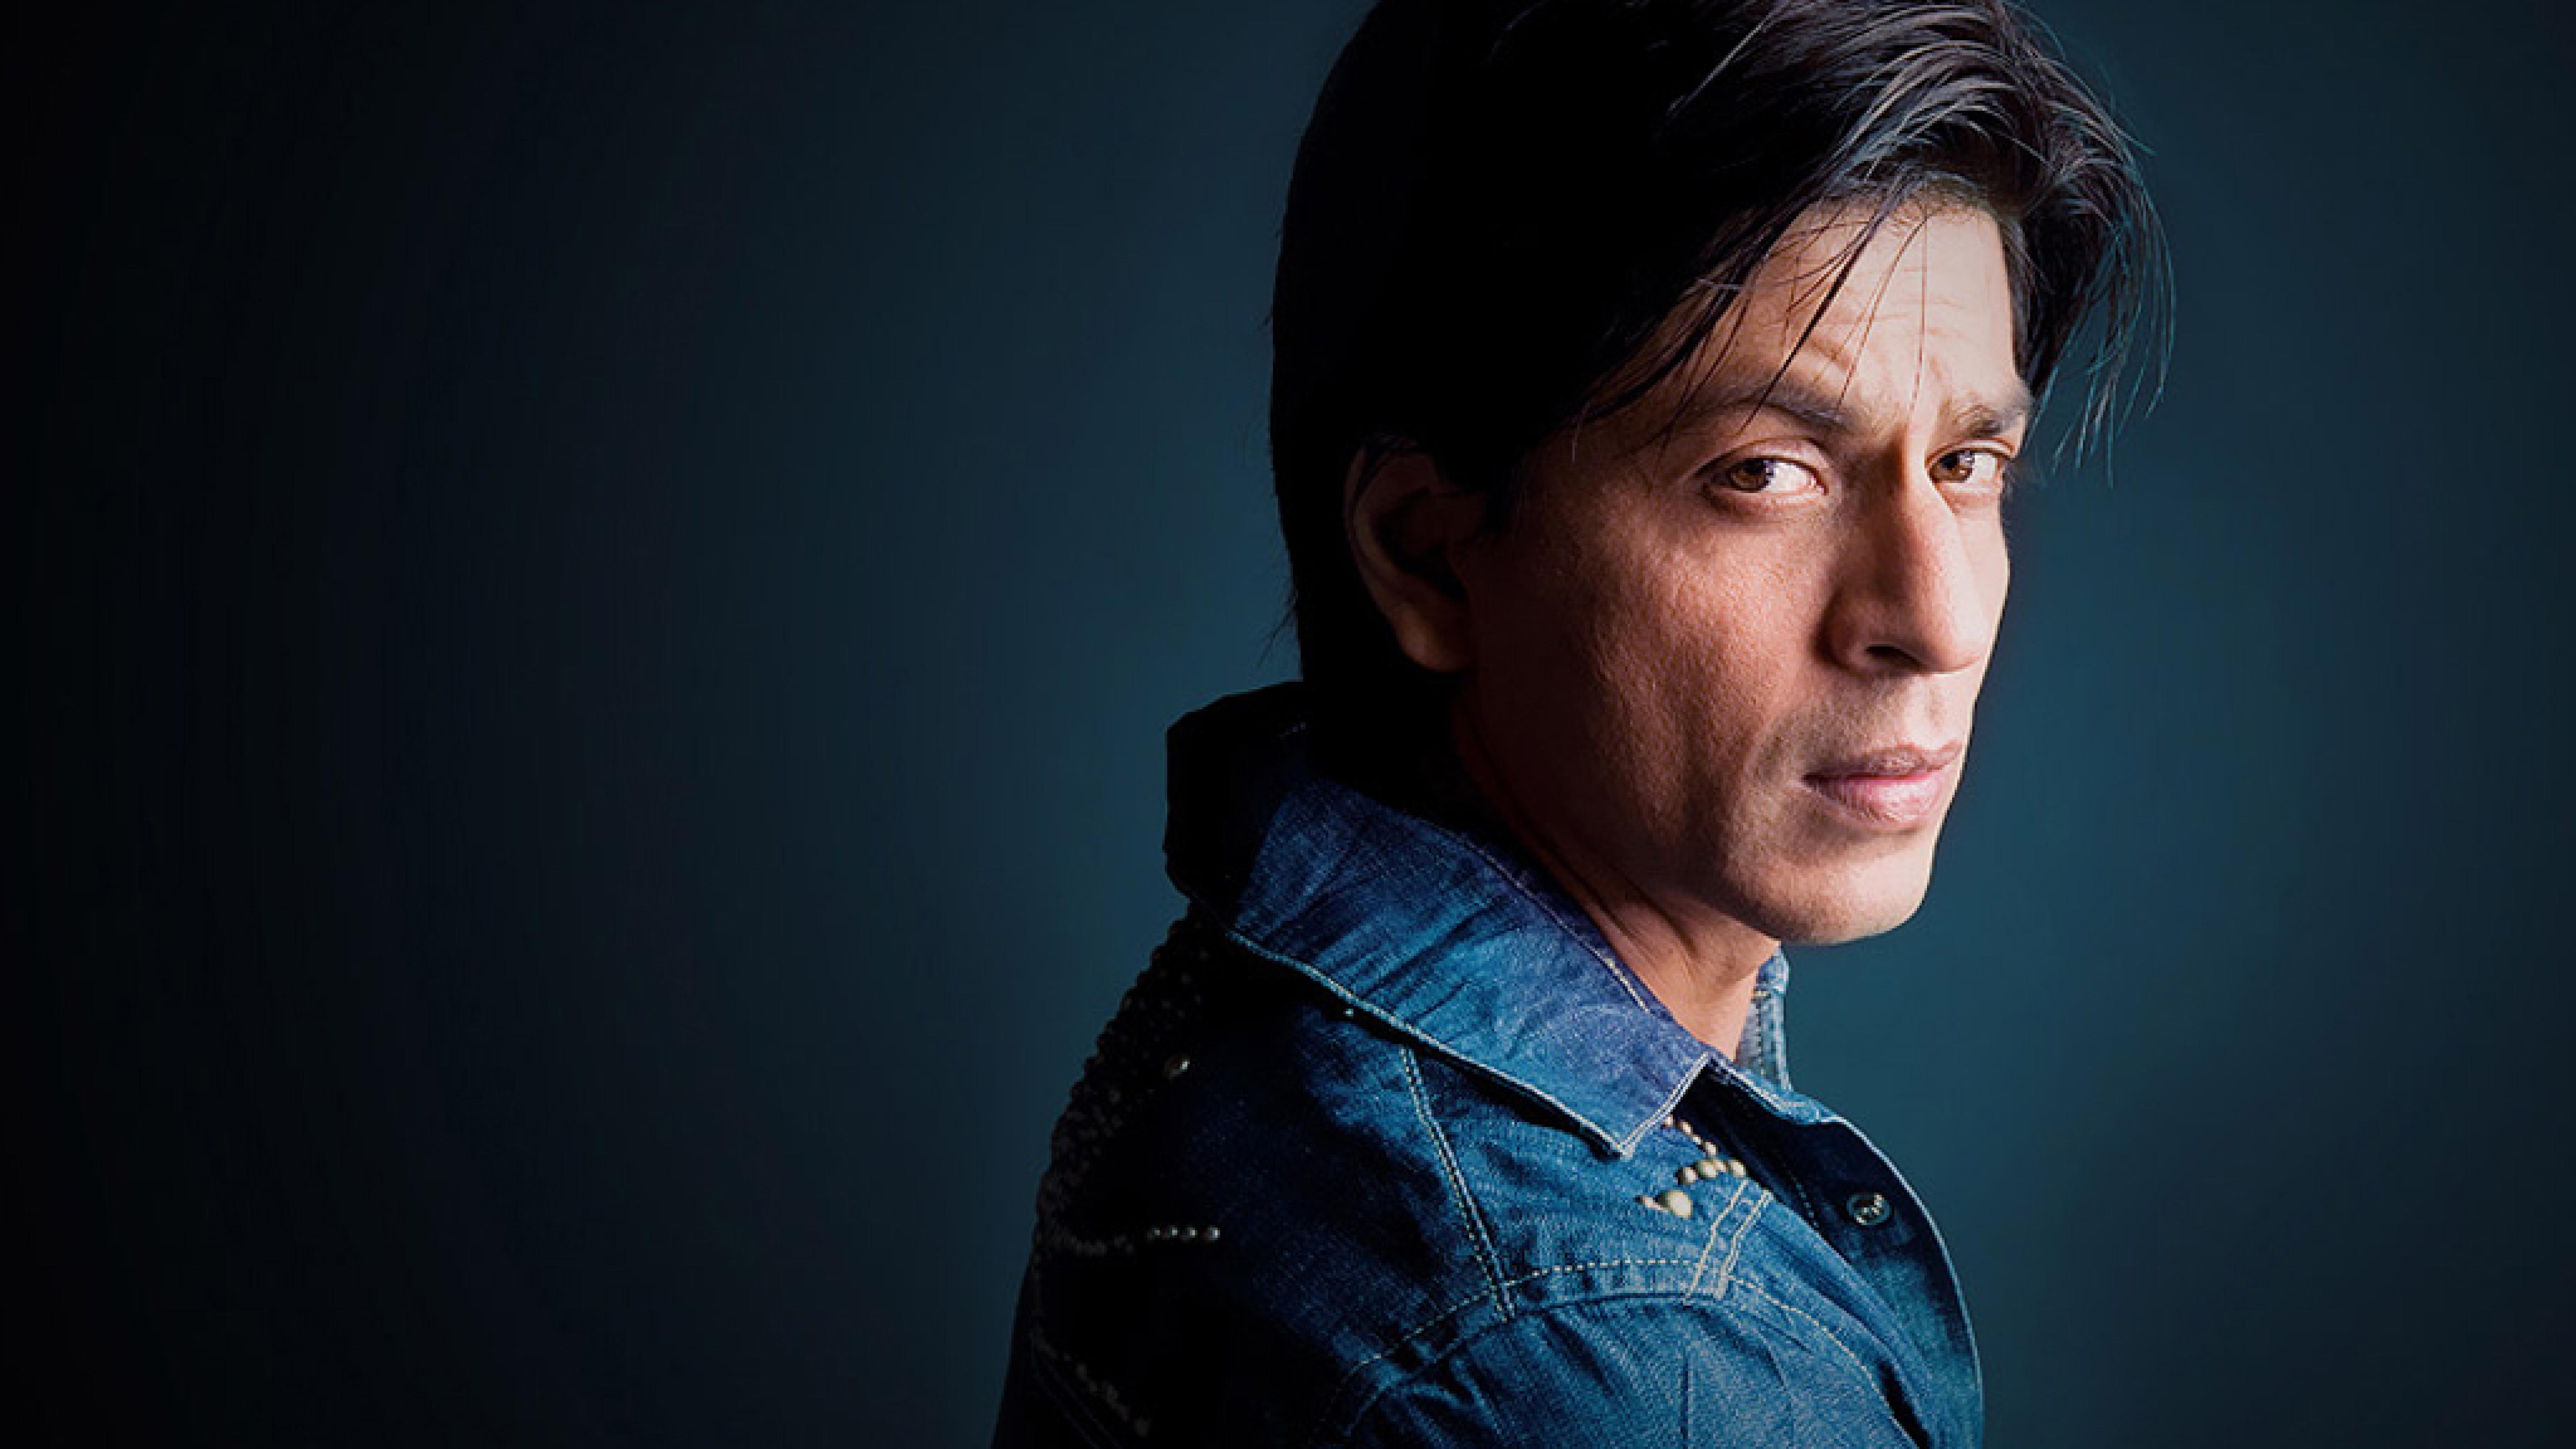 Shahrukh Khan New Unssen Photoshoot, HD Wallpaper